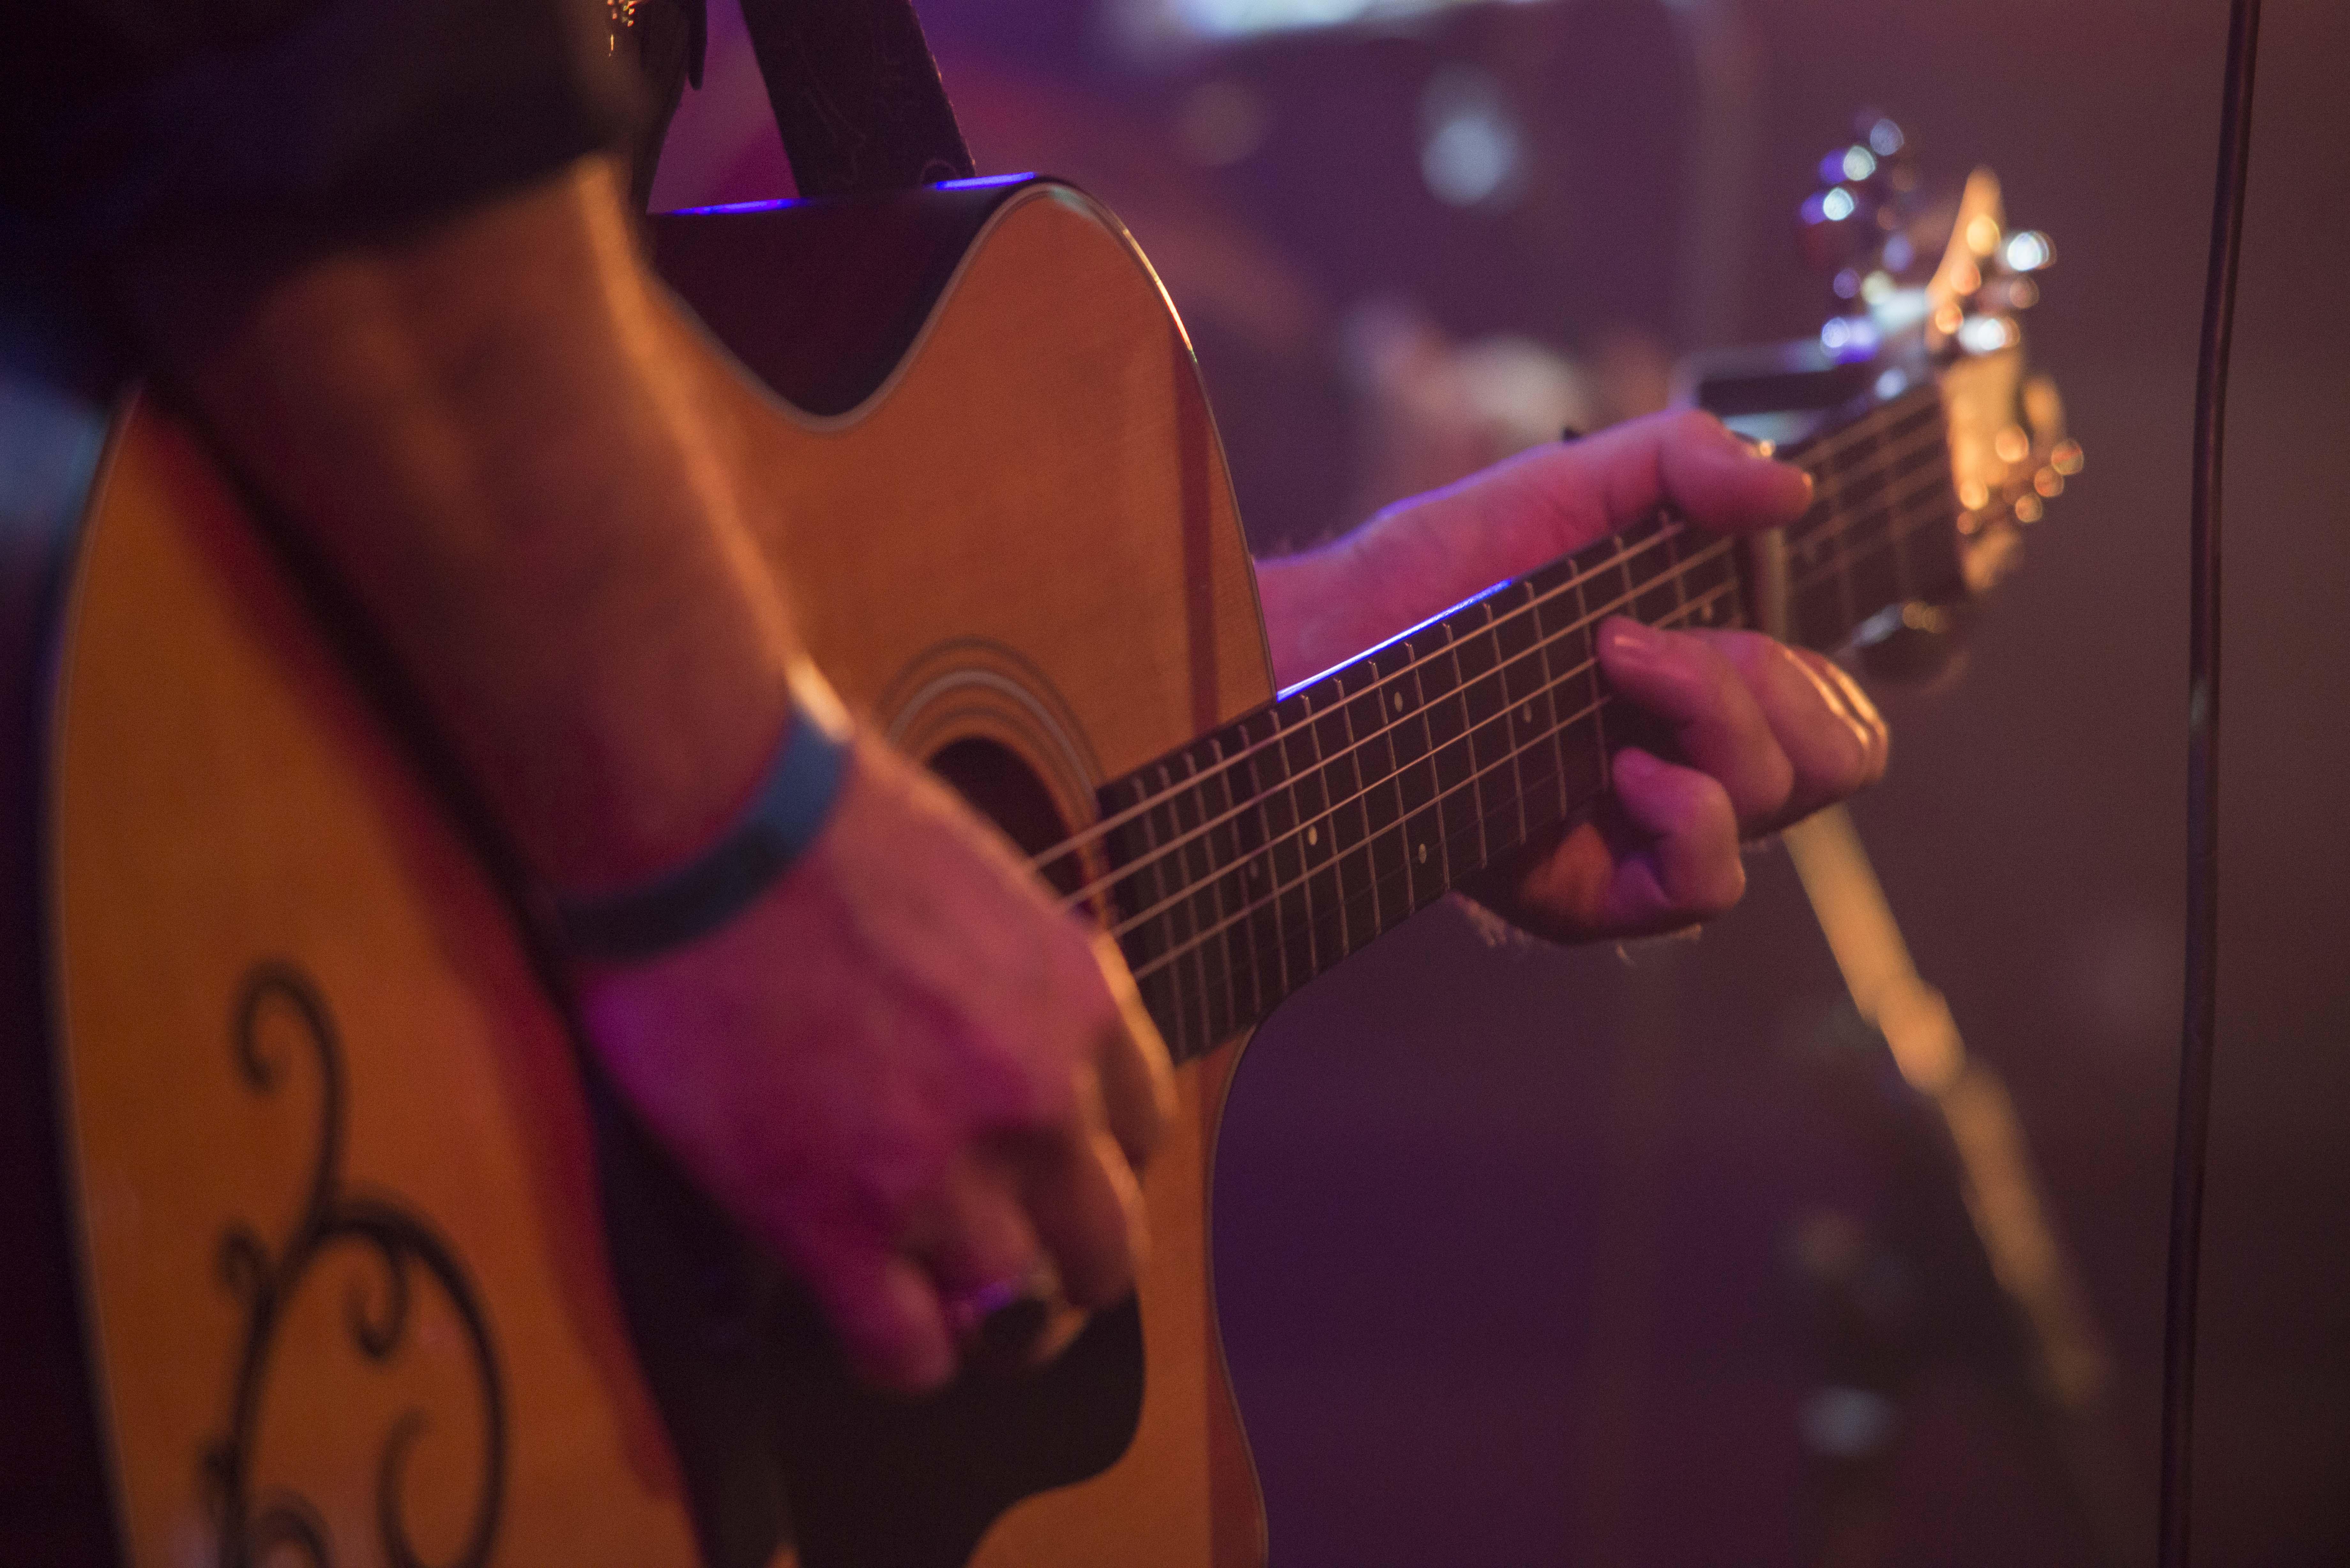 Grant IMC Performing Troubadour-6 4-23-17